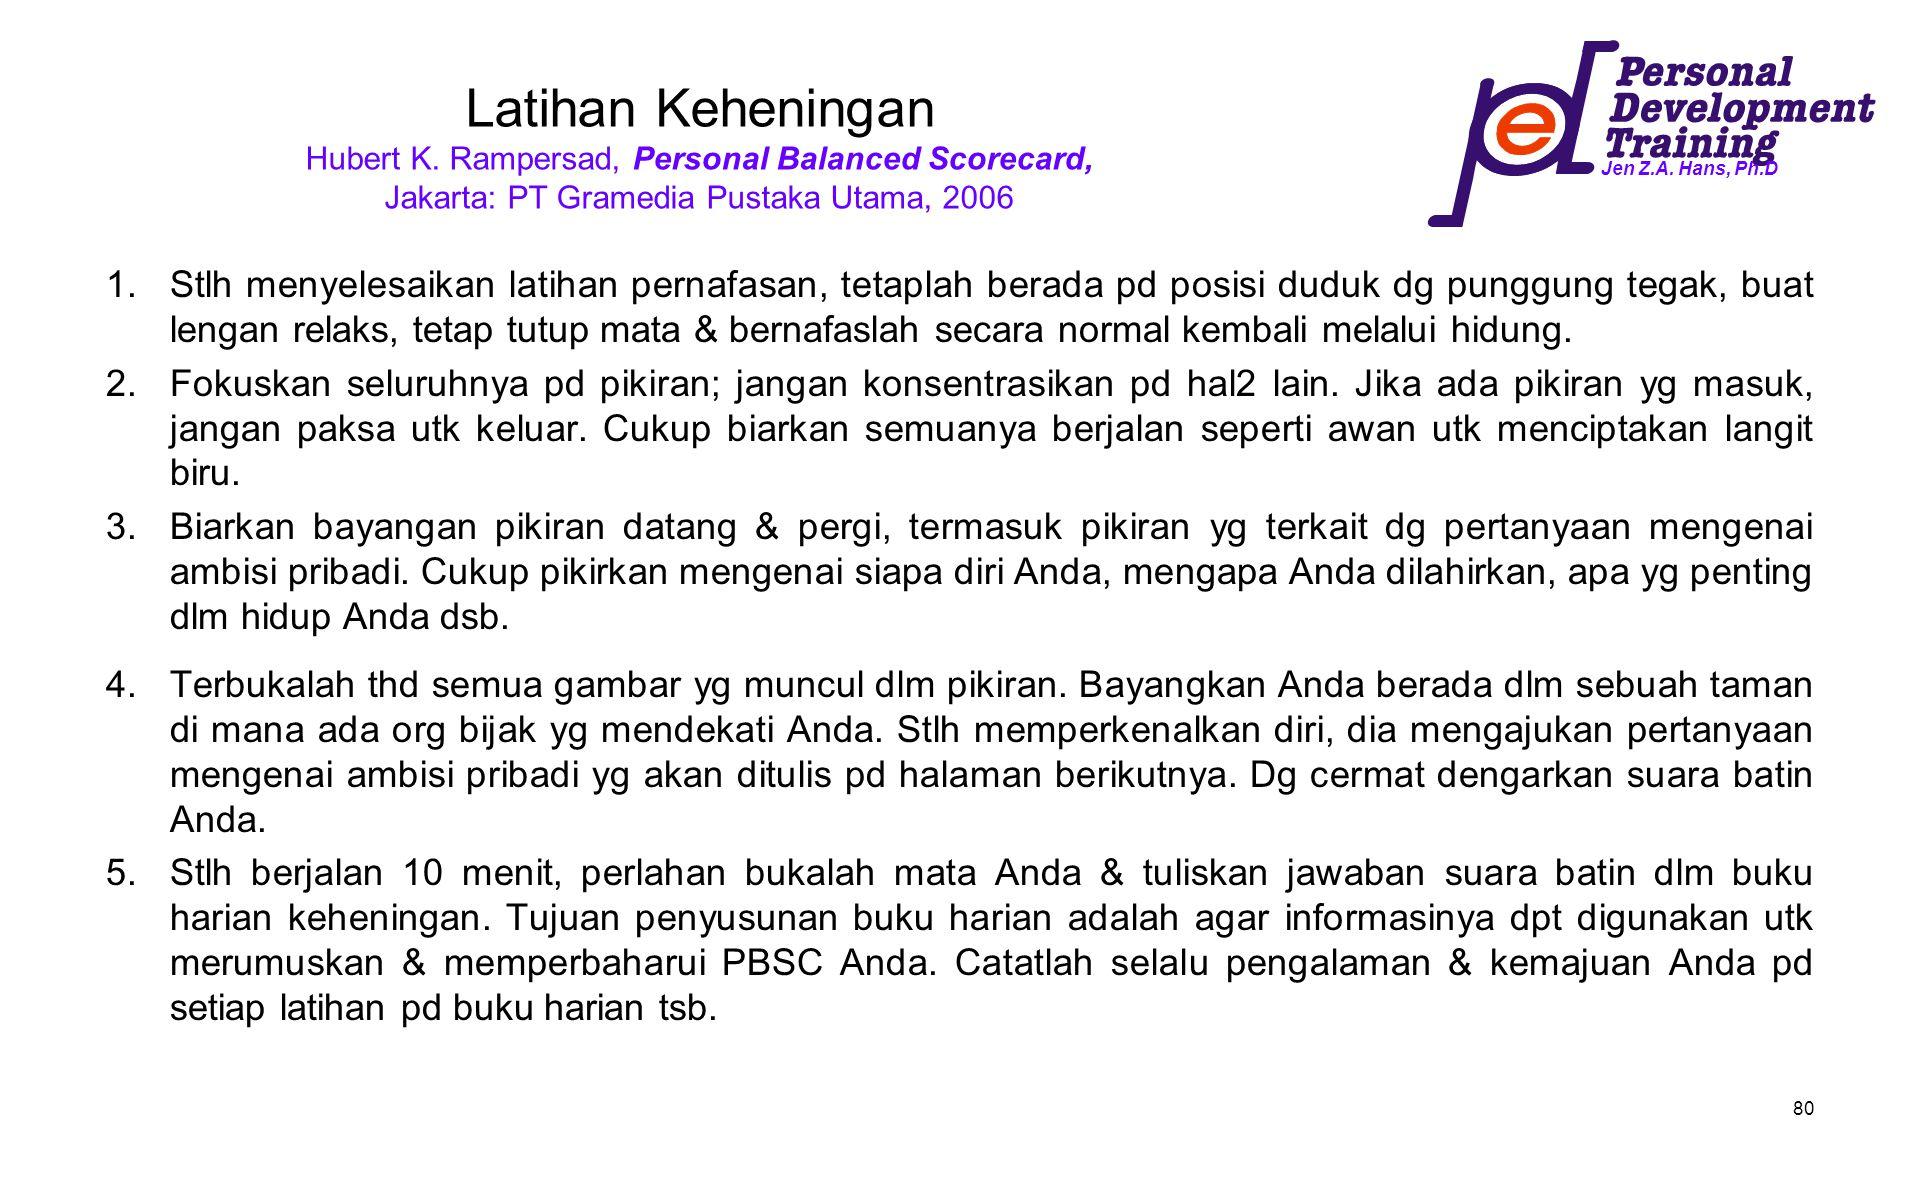 Jen Z.A. Hans, Ph.D 80 Latihan Keheningan Hubert K. Rampersad, Personal Balanced Scorecard, Jakarta: PT Gramedia Pustaka Utama, 2006 1.Stlh menyelesai